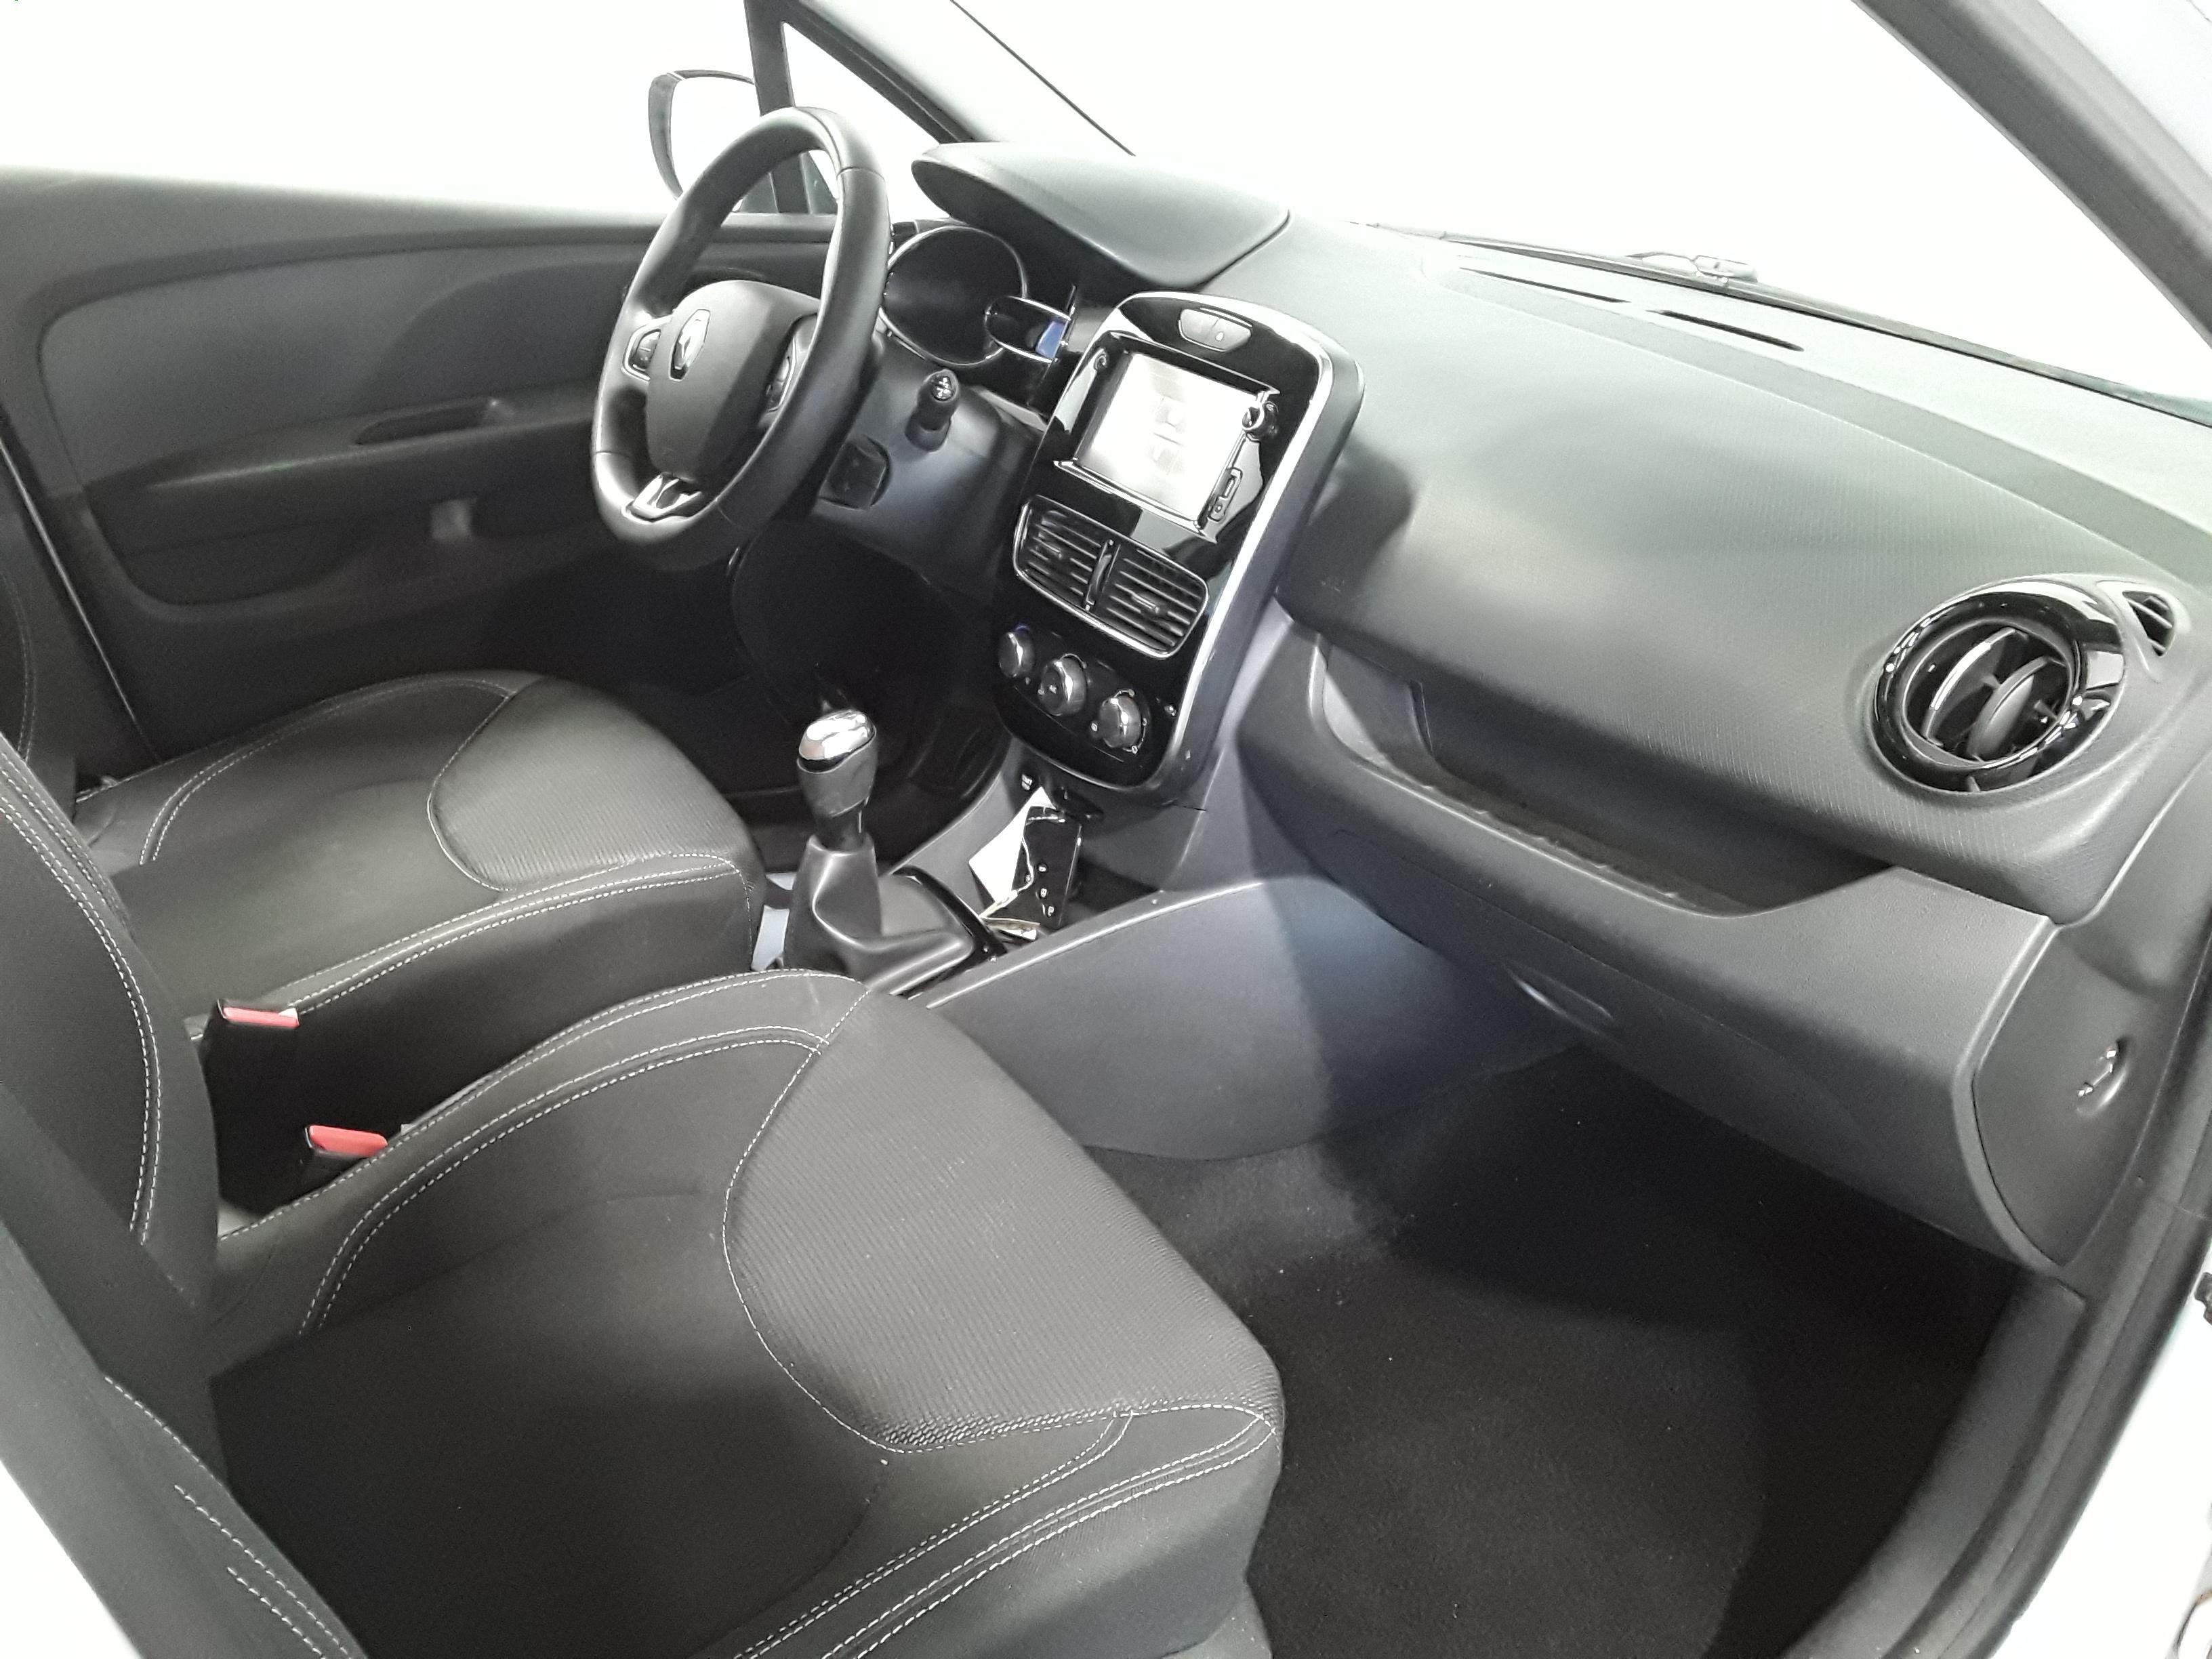 RENAULT CLIO IV SOCIETE 2017 à 6700 € - Photo n°5